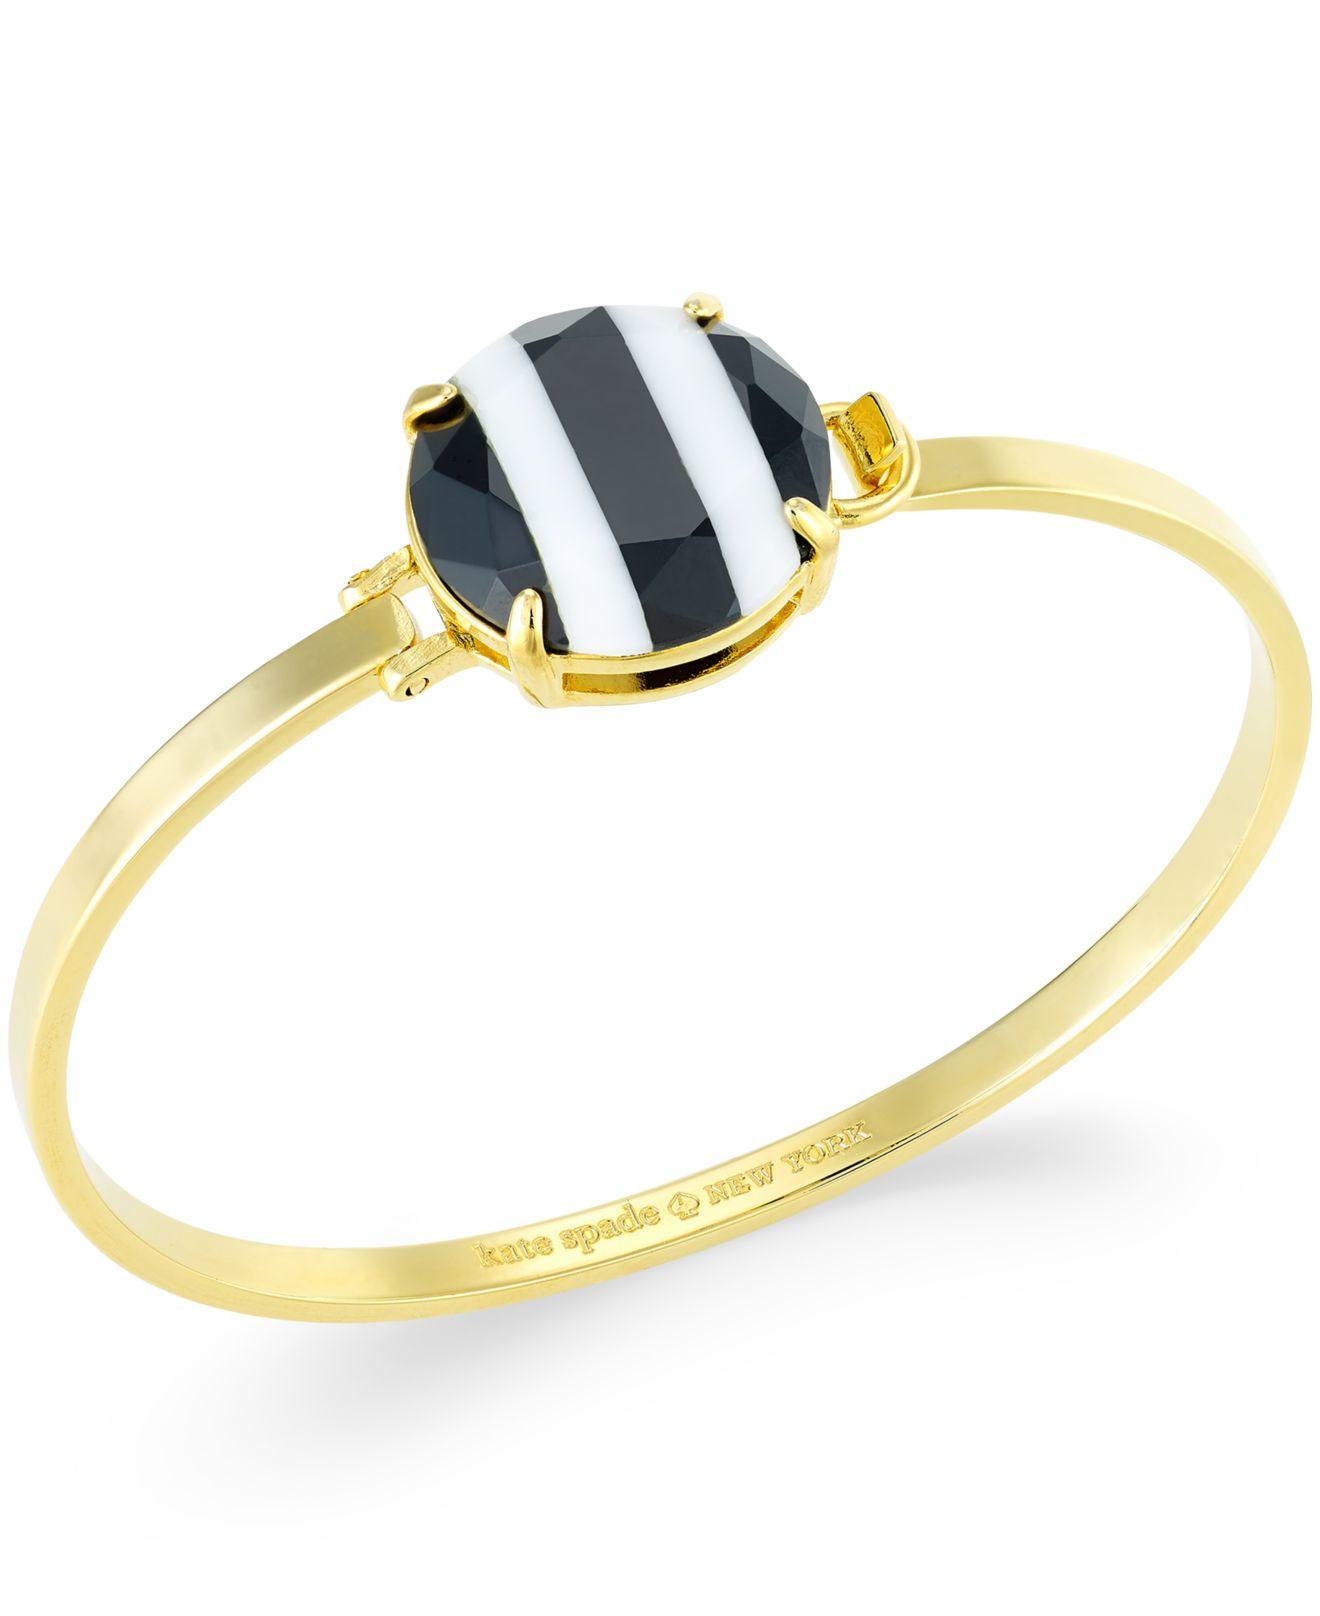 Kate Spade New York Goldtone Jet Stripe Bangle Bracelet. Purple Earrings. Platinum Diamond Engagement Rings. Chain Rings. Custom Gold Chains. Easy Necklace. Multiple Sclerosis Awareness Bracelet. Gaelic Engagement Rings. Jewellery Designs Beads